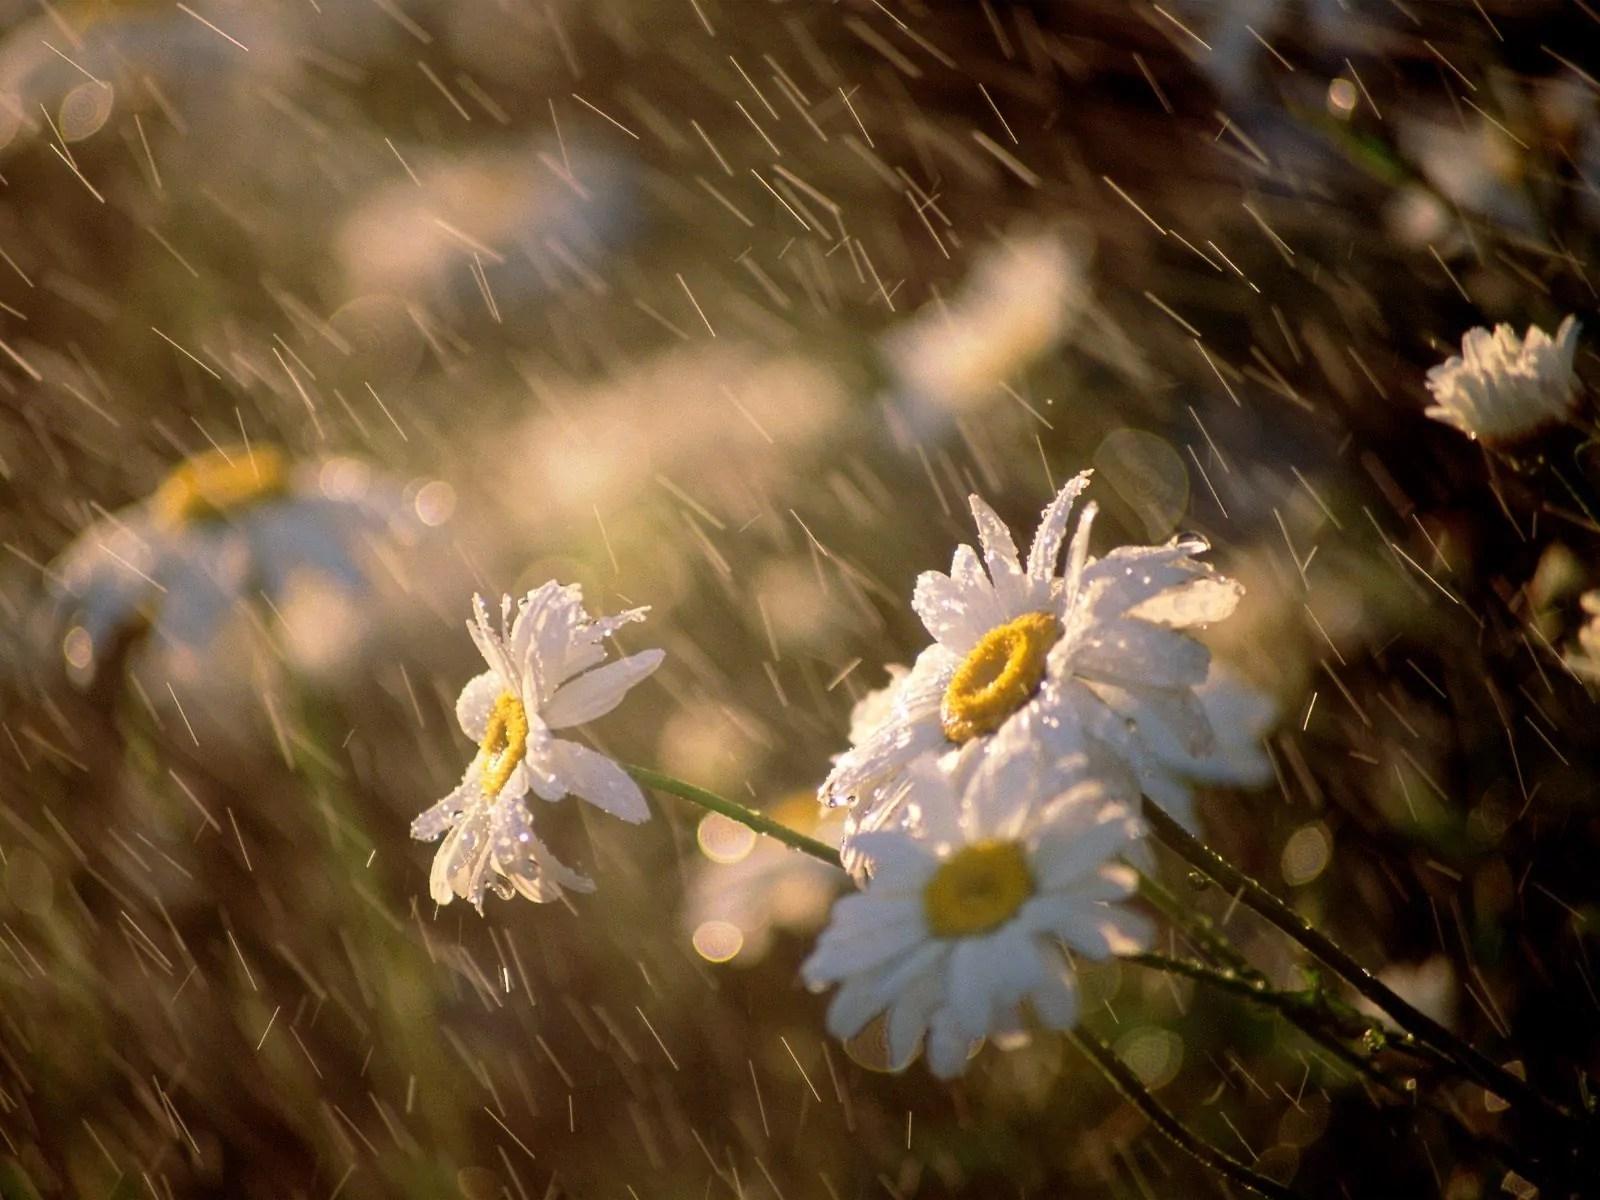 https://i1.wp.com/www.meteoweb.eu/wp-content/uploads/2015/01/pioggia-estiva.jpg